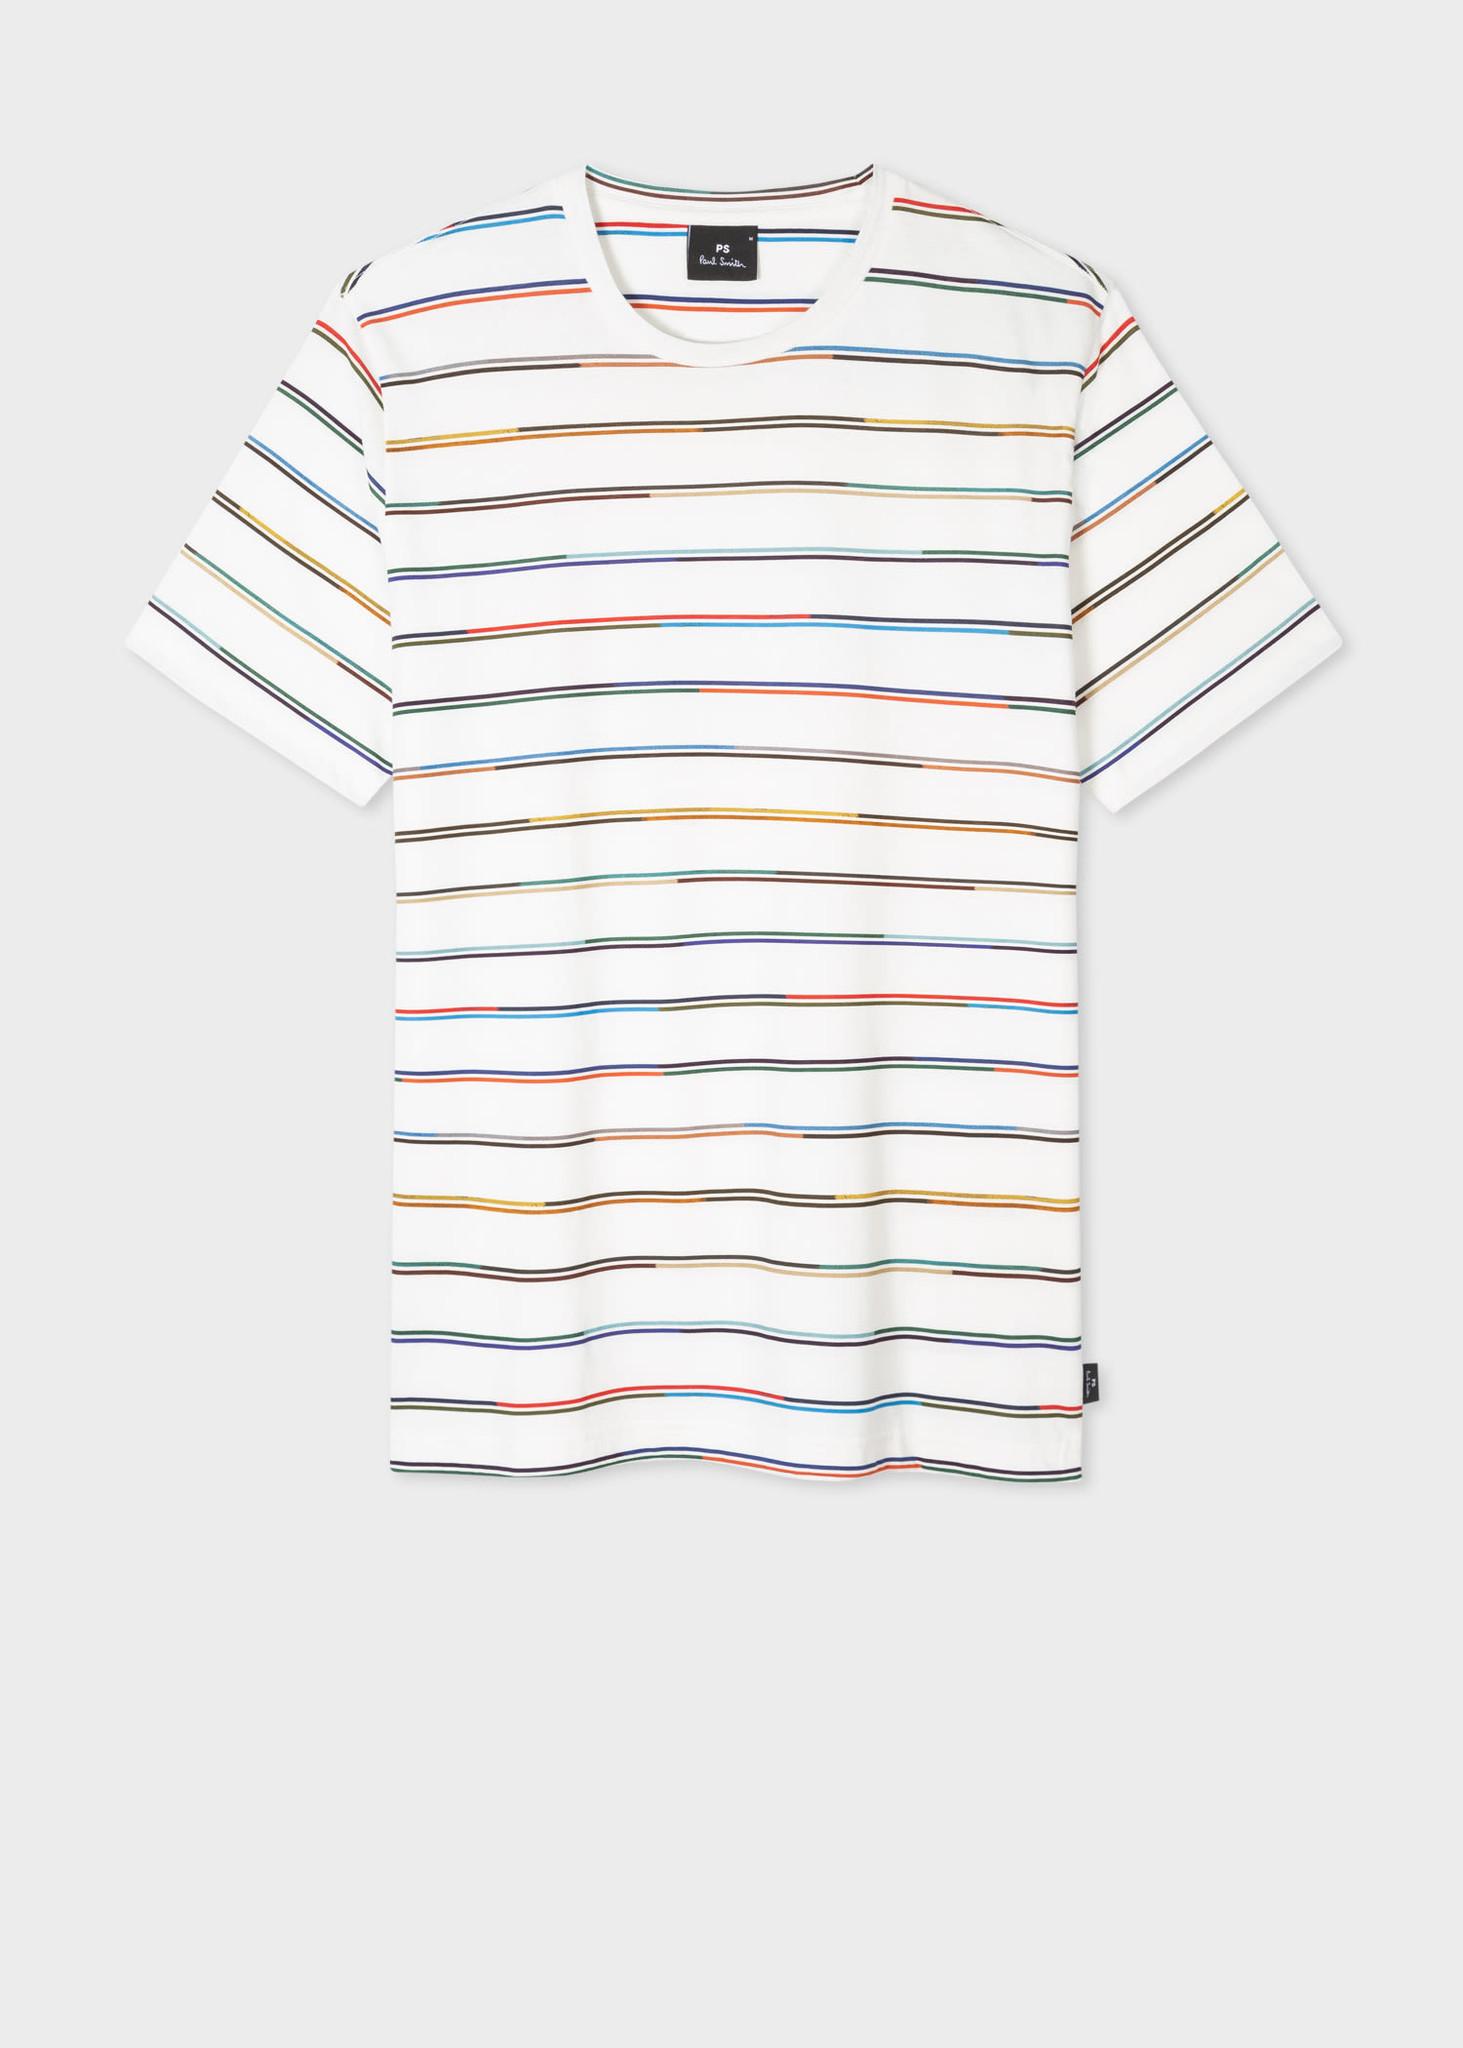 Paul Smith T-shirt Paul Smith M2R-238U-F21165-02